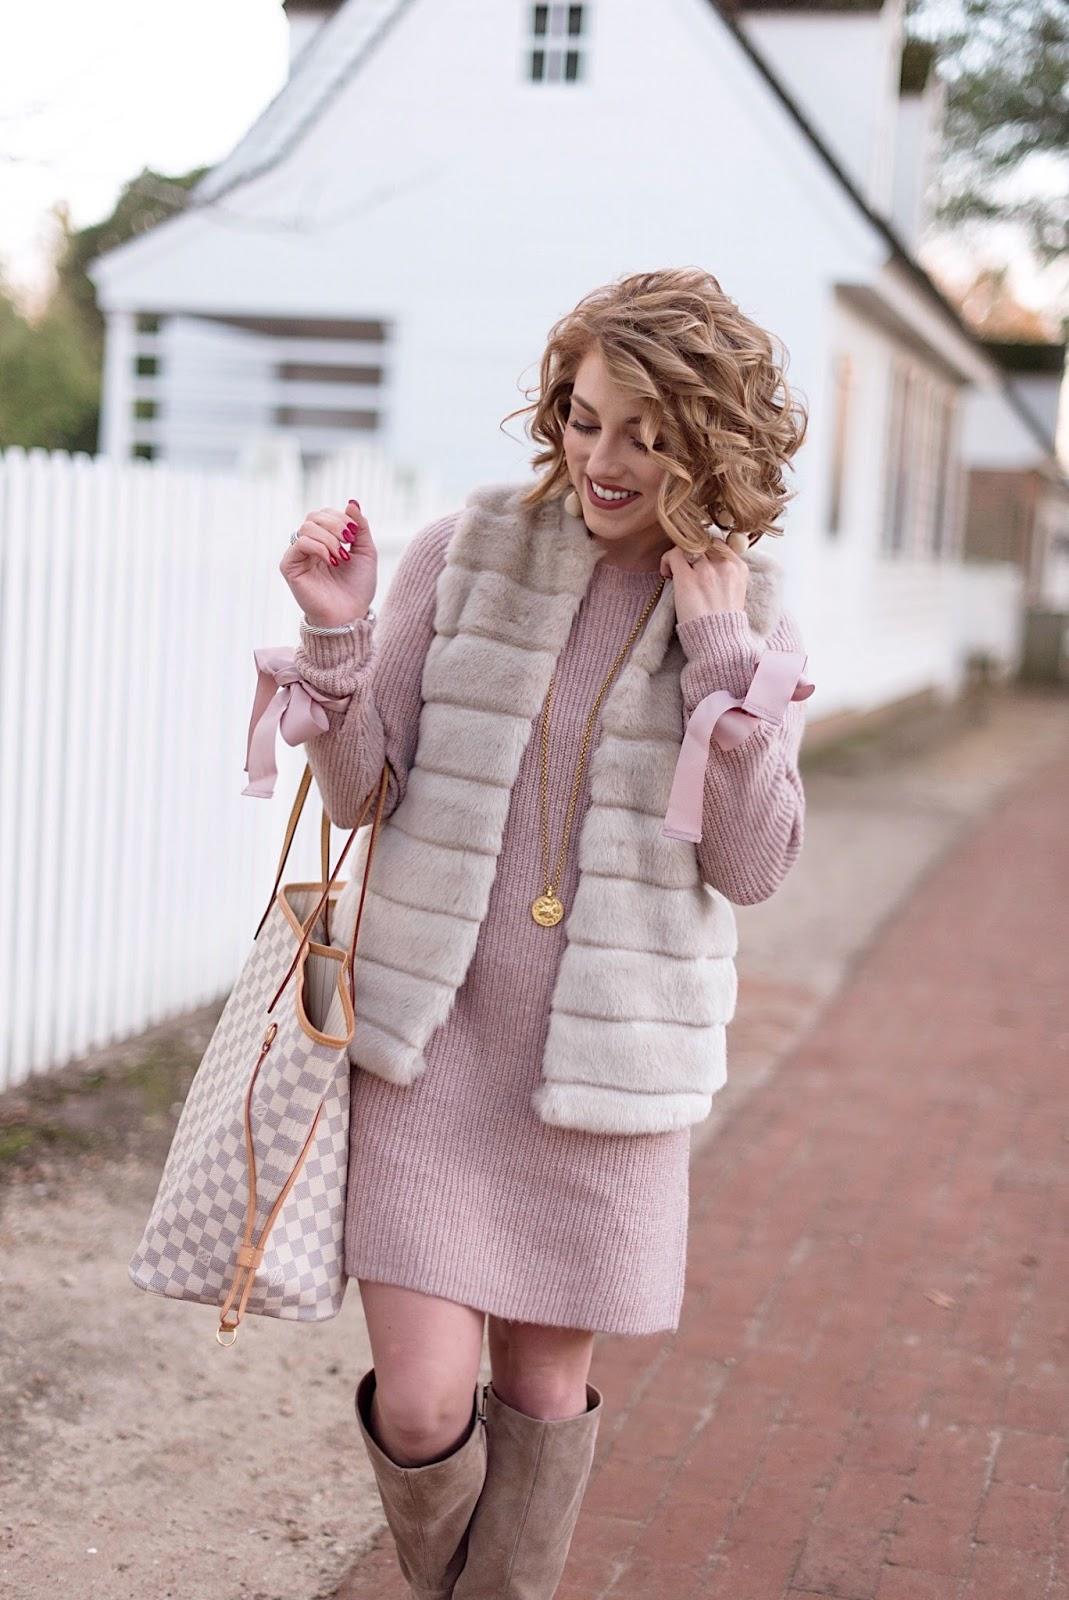 Bow Sleeve Sweater Dress & Faux Fur Vest - Something Delightful Blog